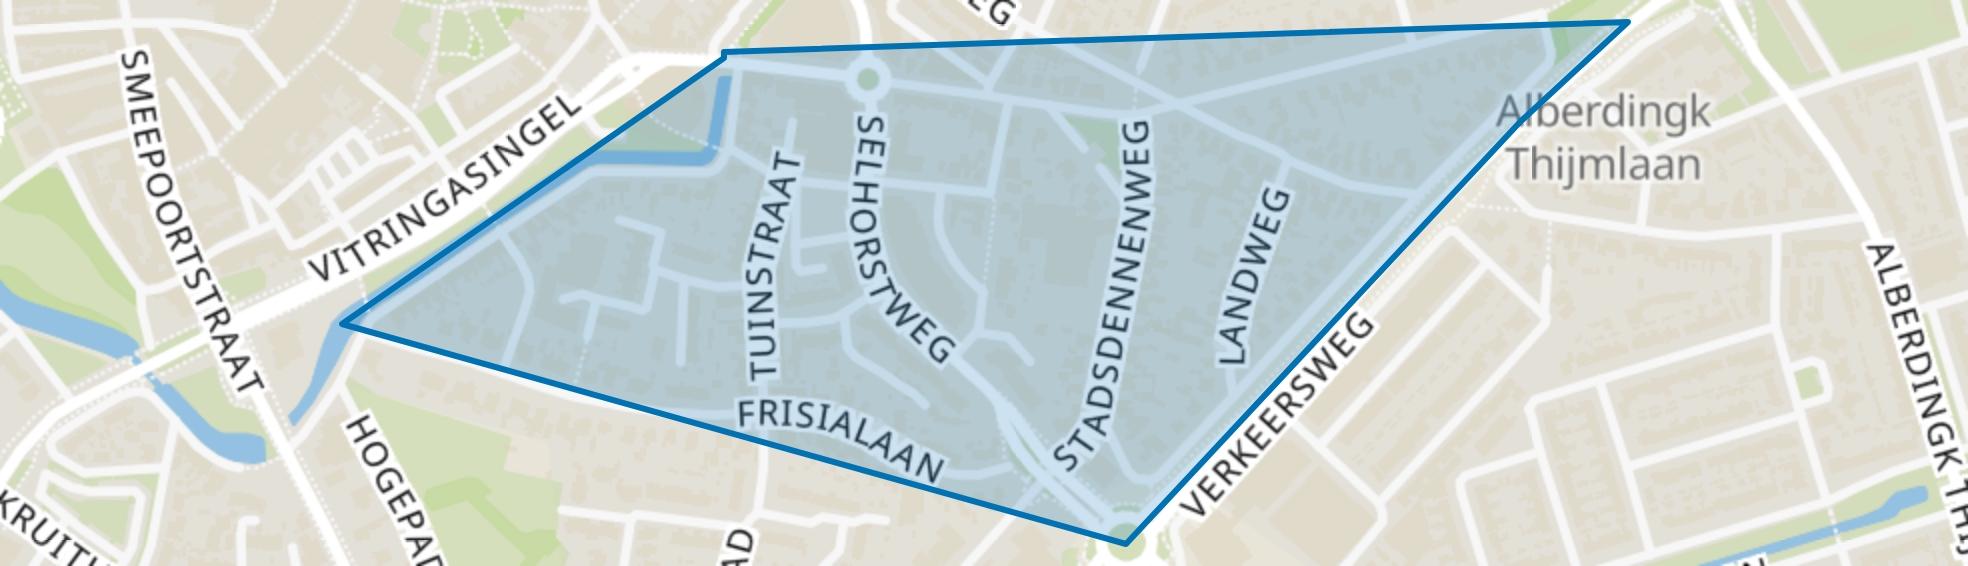 Friesegracht-Noord, Harderwijk map